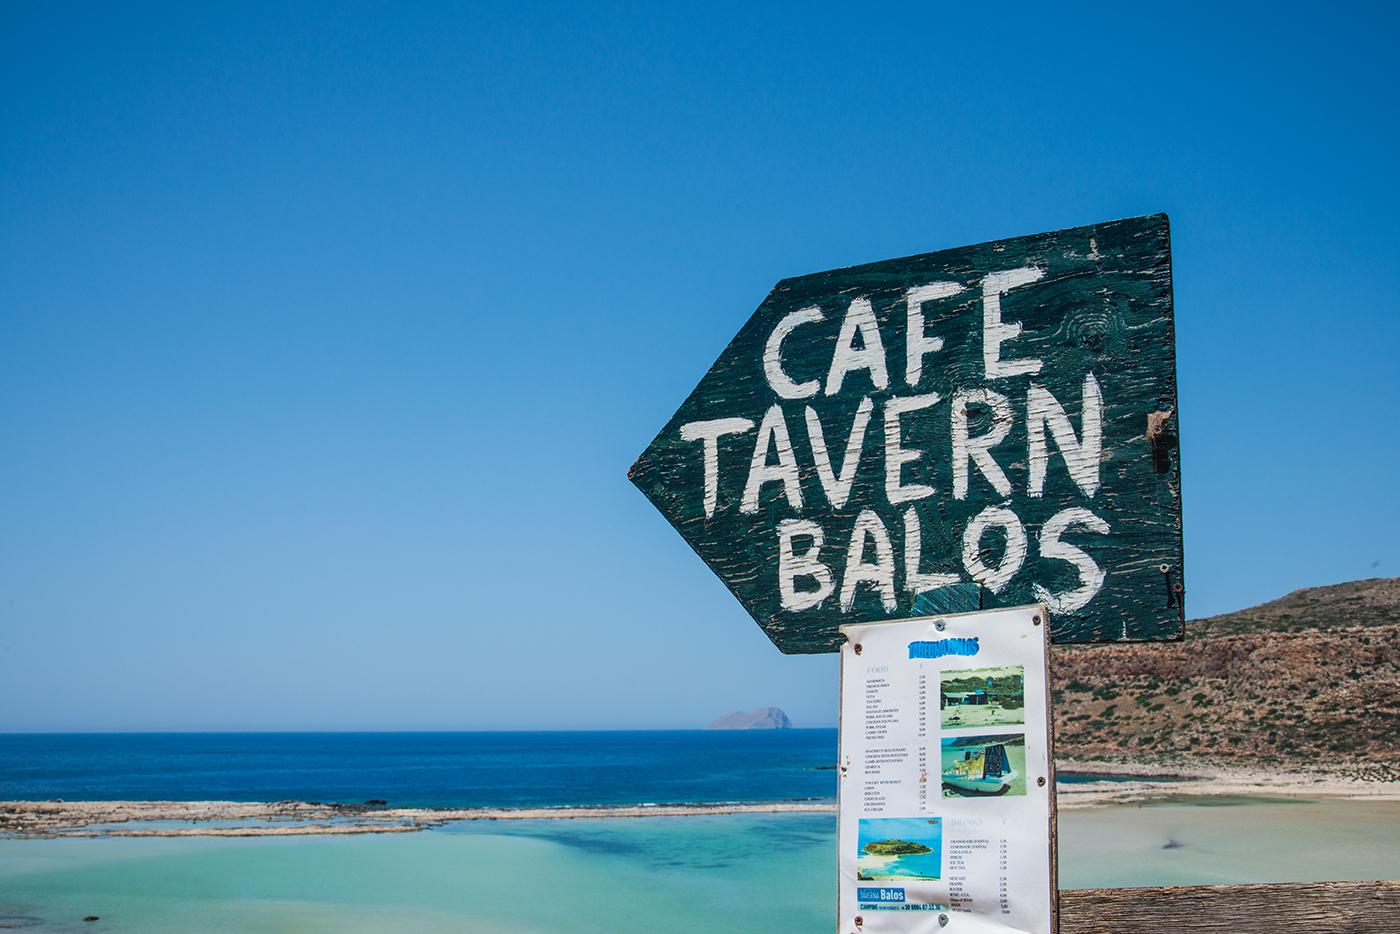 180360_BalosLagoon_CafeTavernBalos